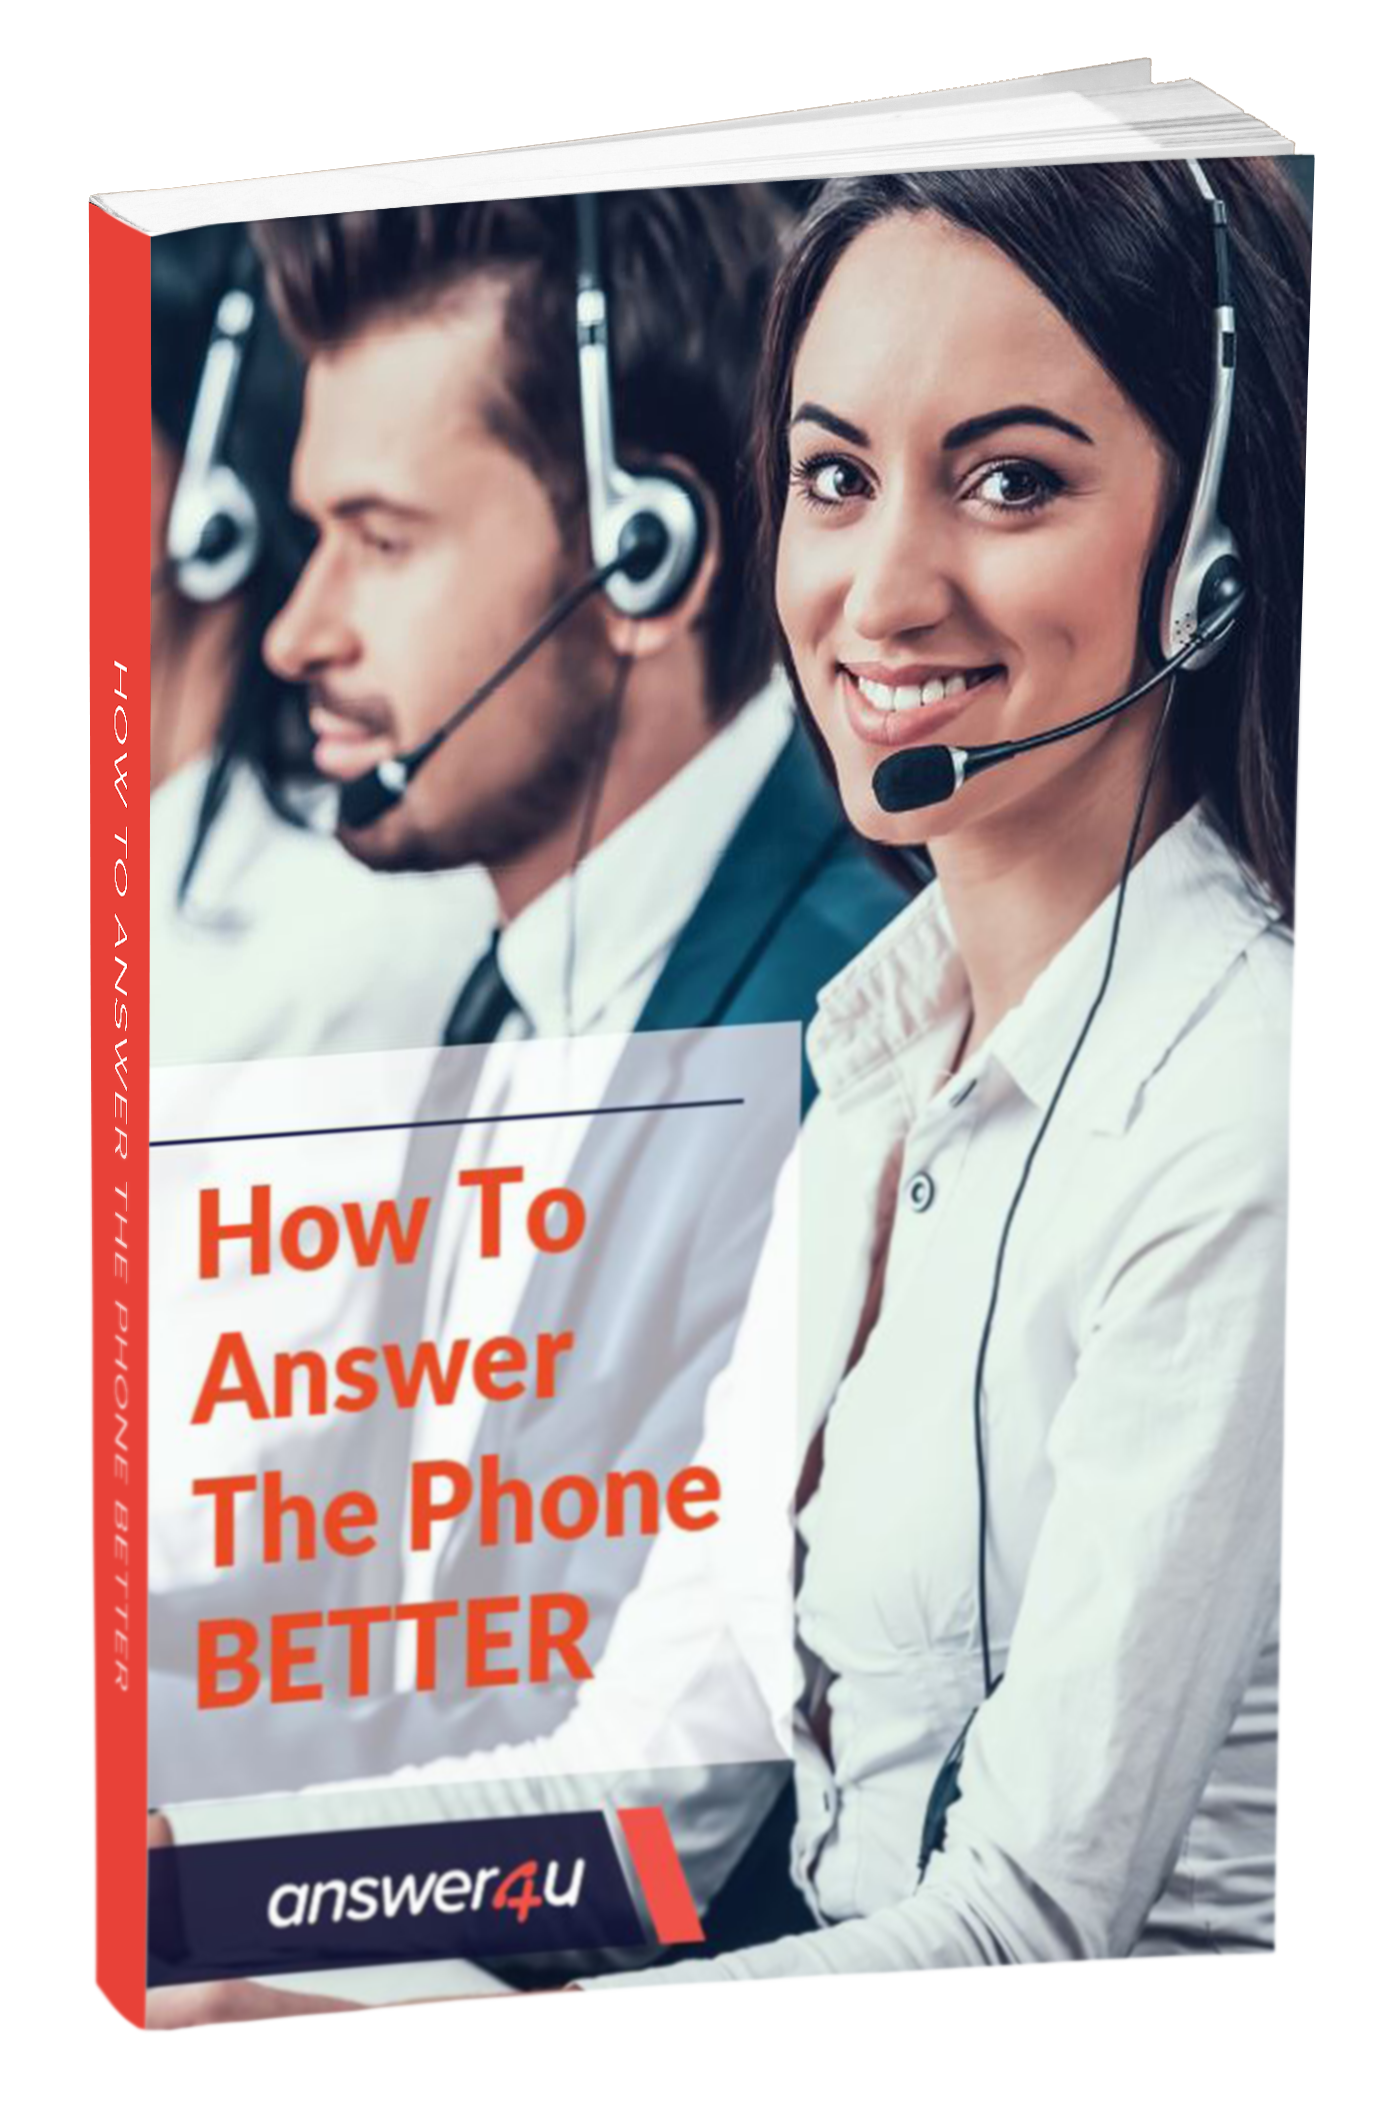 answer-4-u-answerthephonebetterguide-mock-up-1